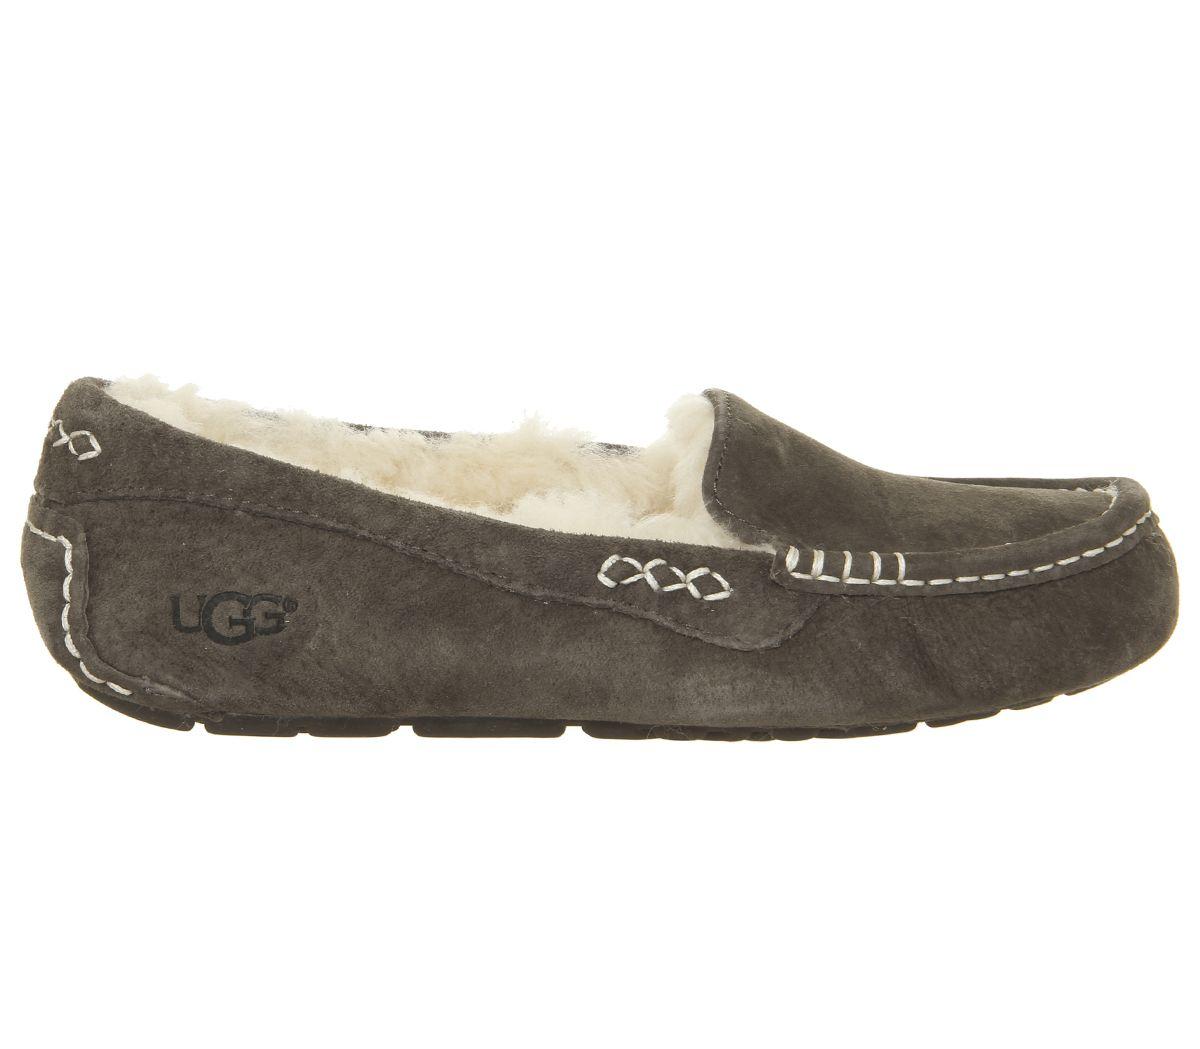 d69ea3eddb9 Ansley Slippers